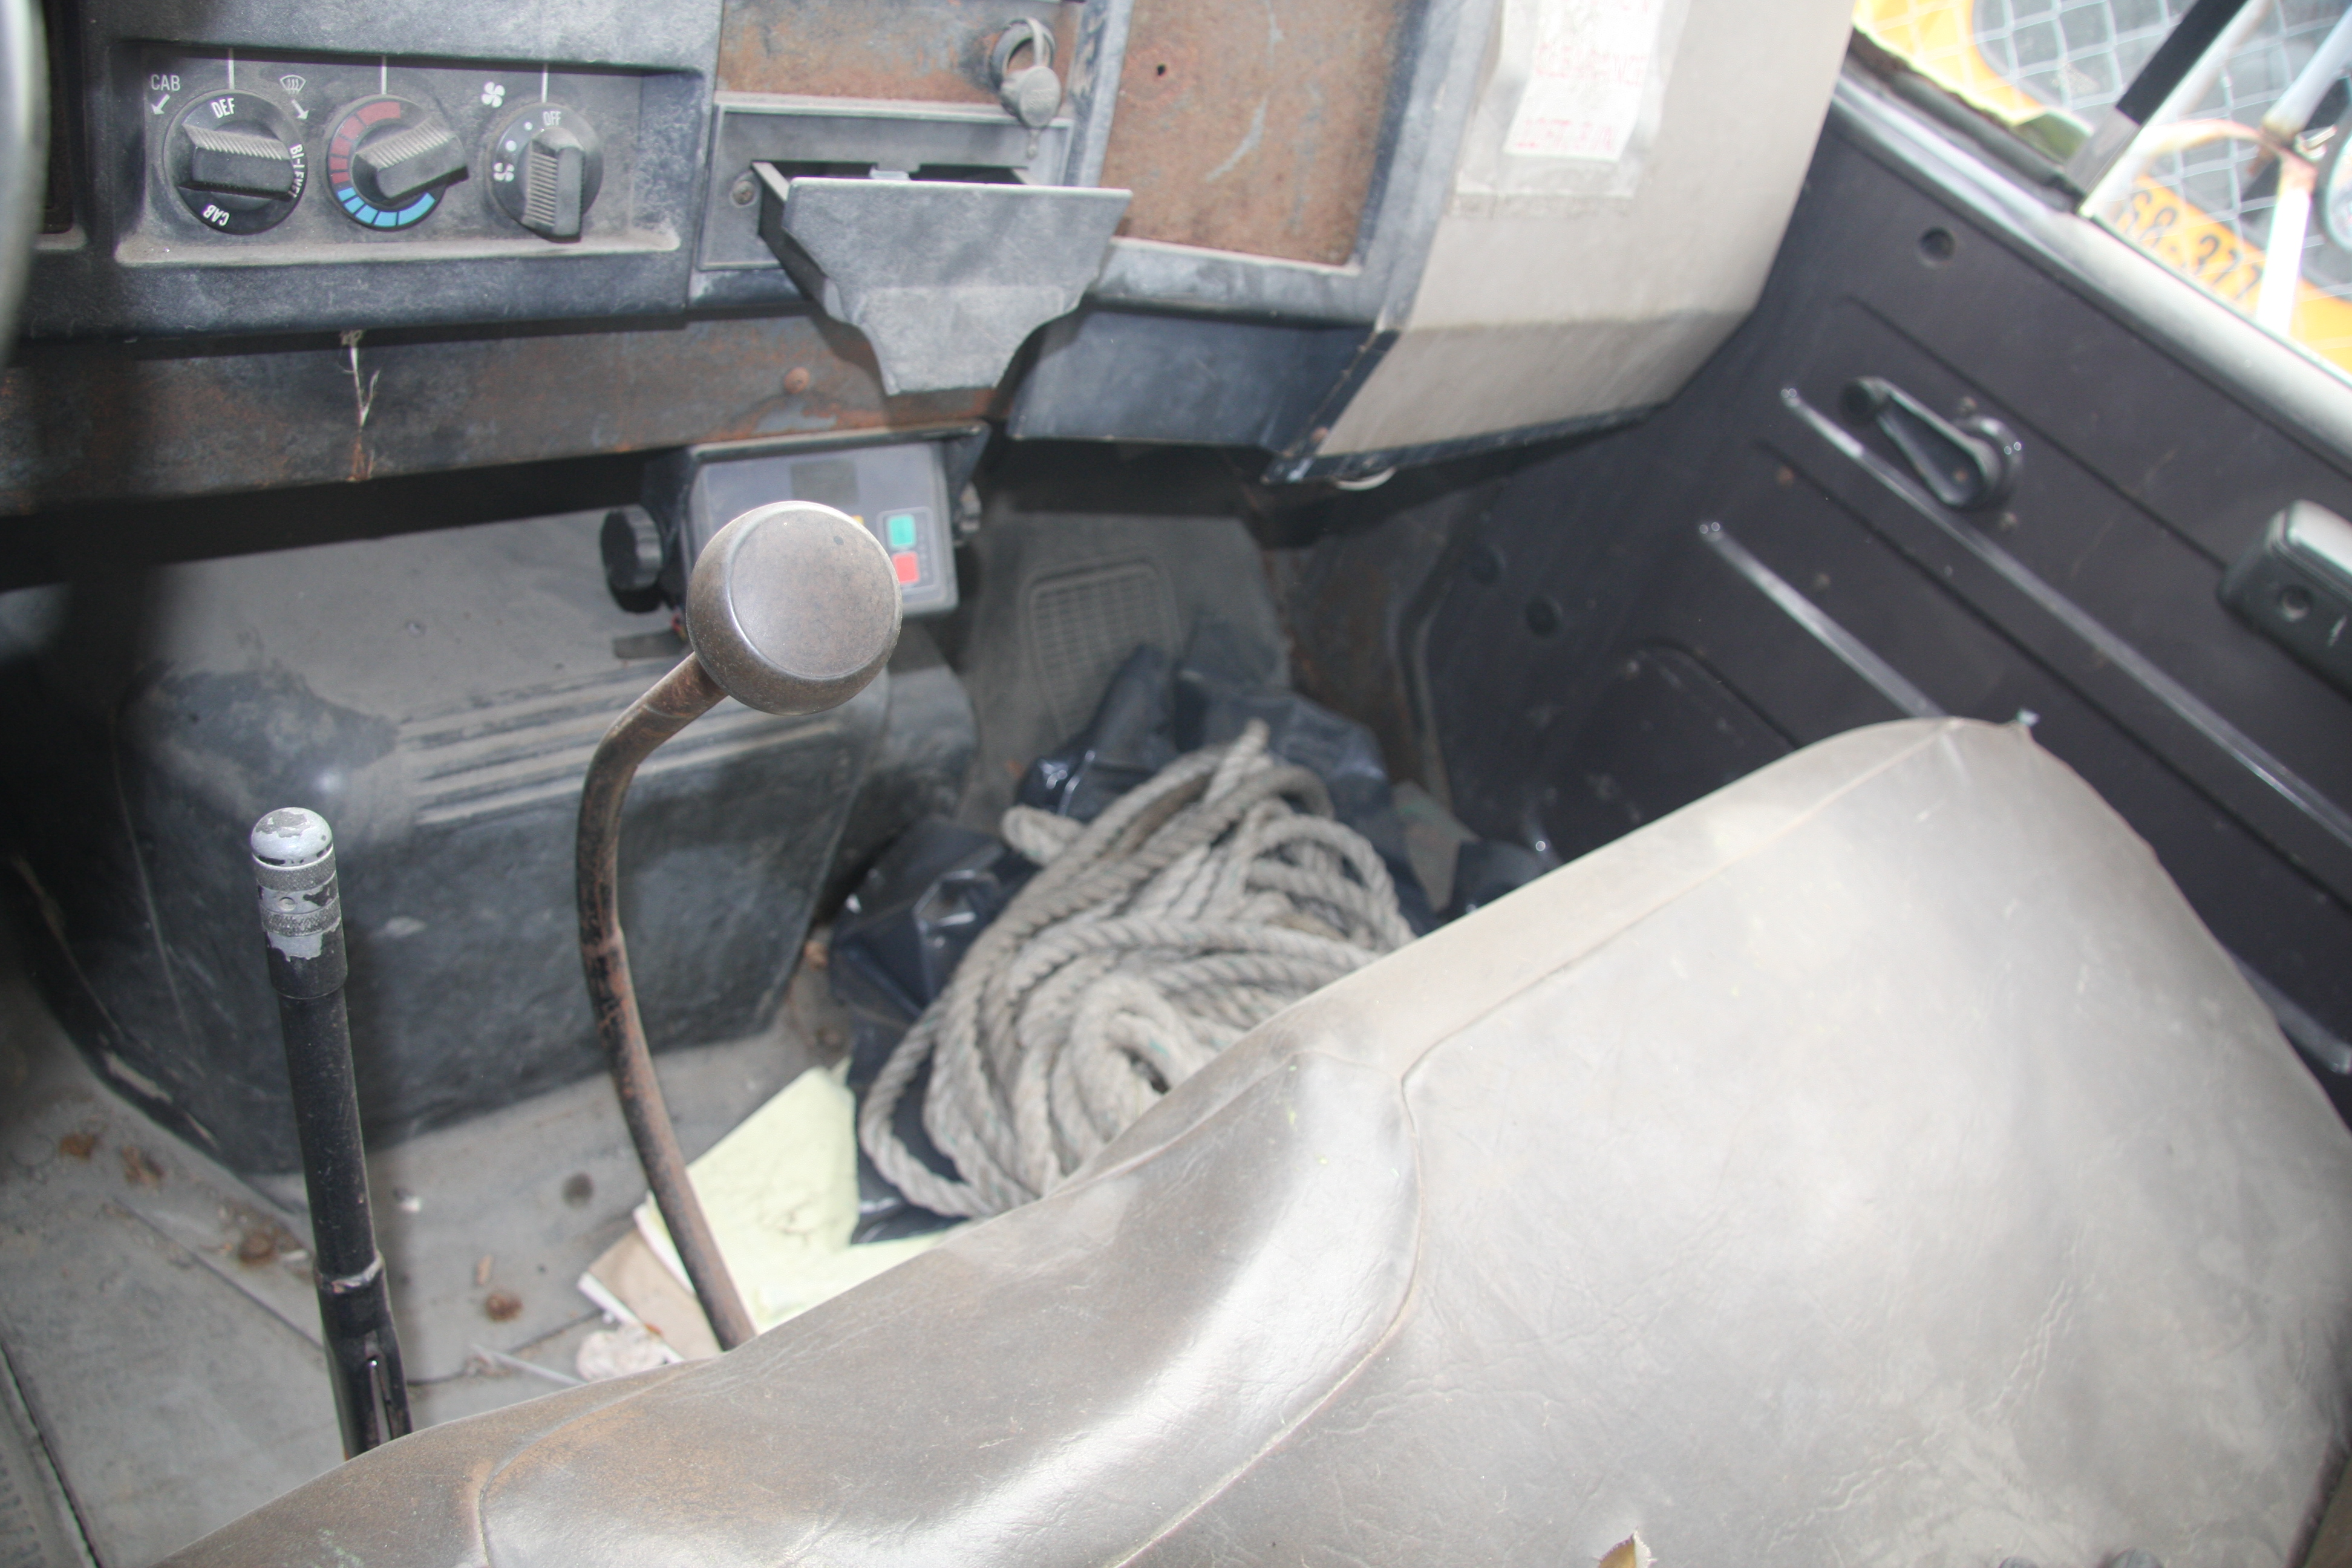 Lot 30 - 1992 INTERNATIONAL 4700 4X2 ATTENUATOR TRUCK, RACK BODY WITH SIDE MOUNTED PLATFORM, MANUAL